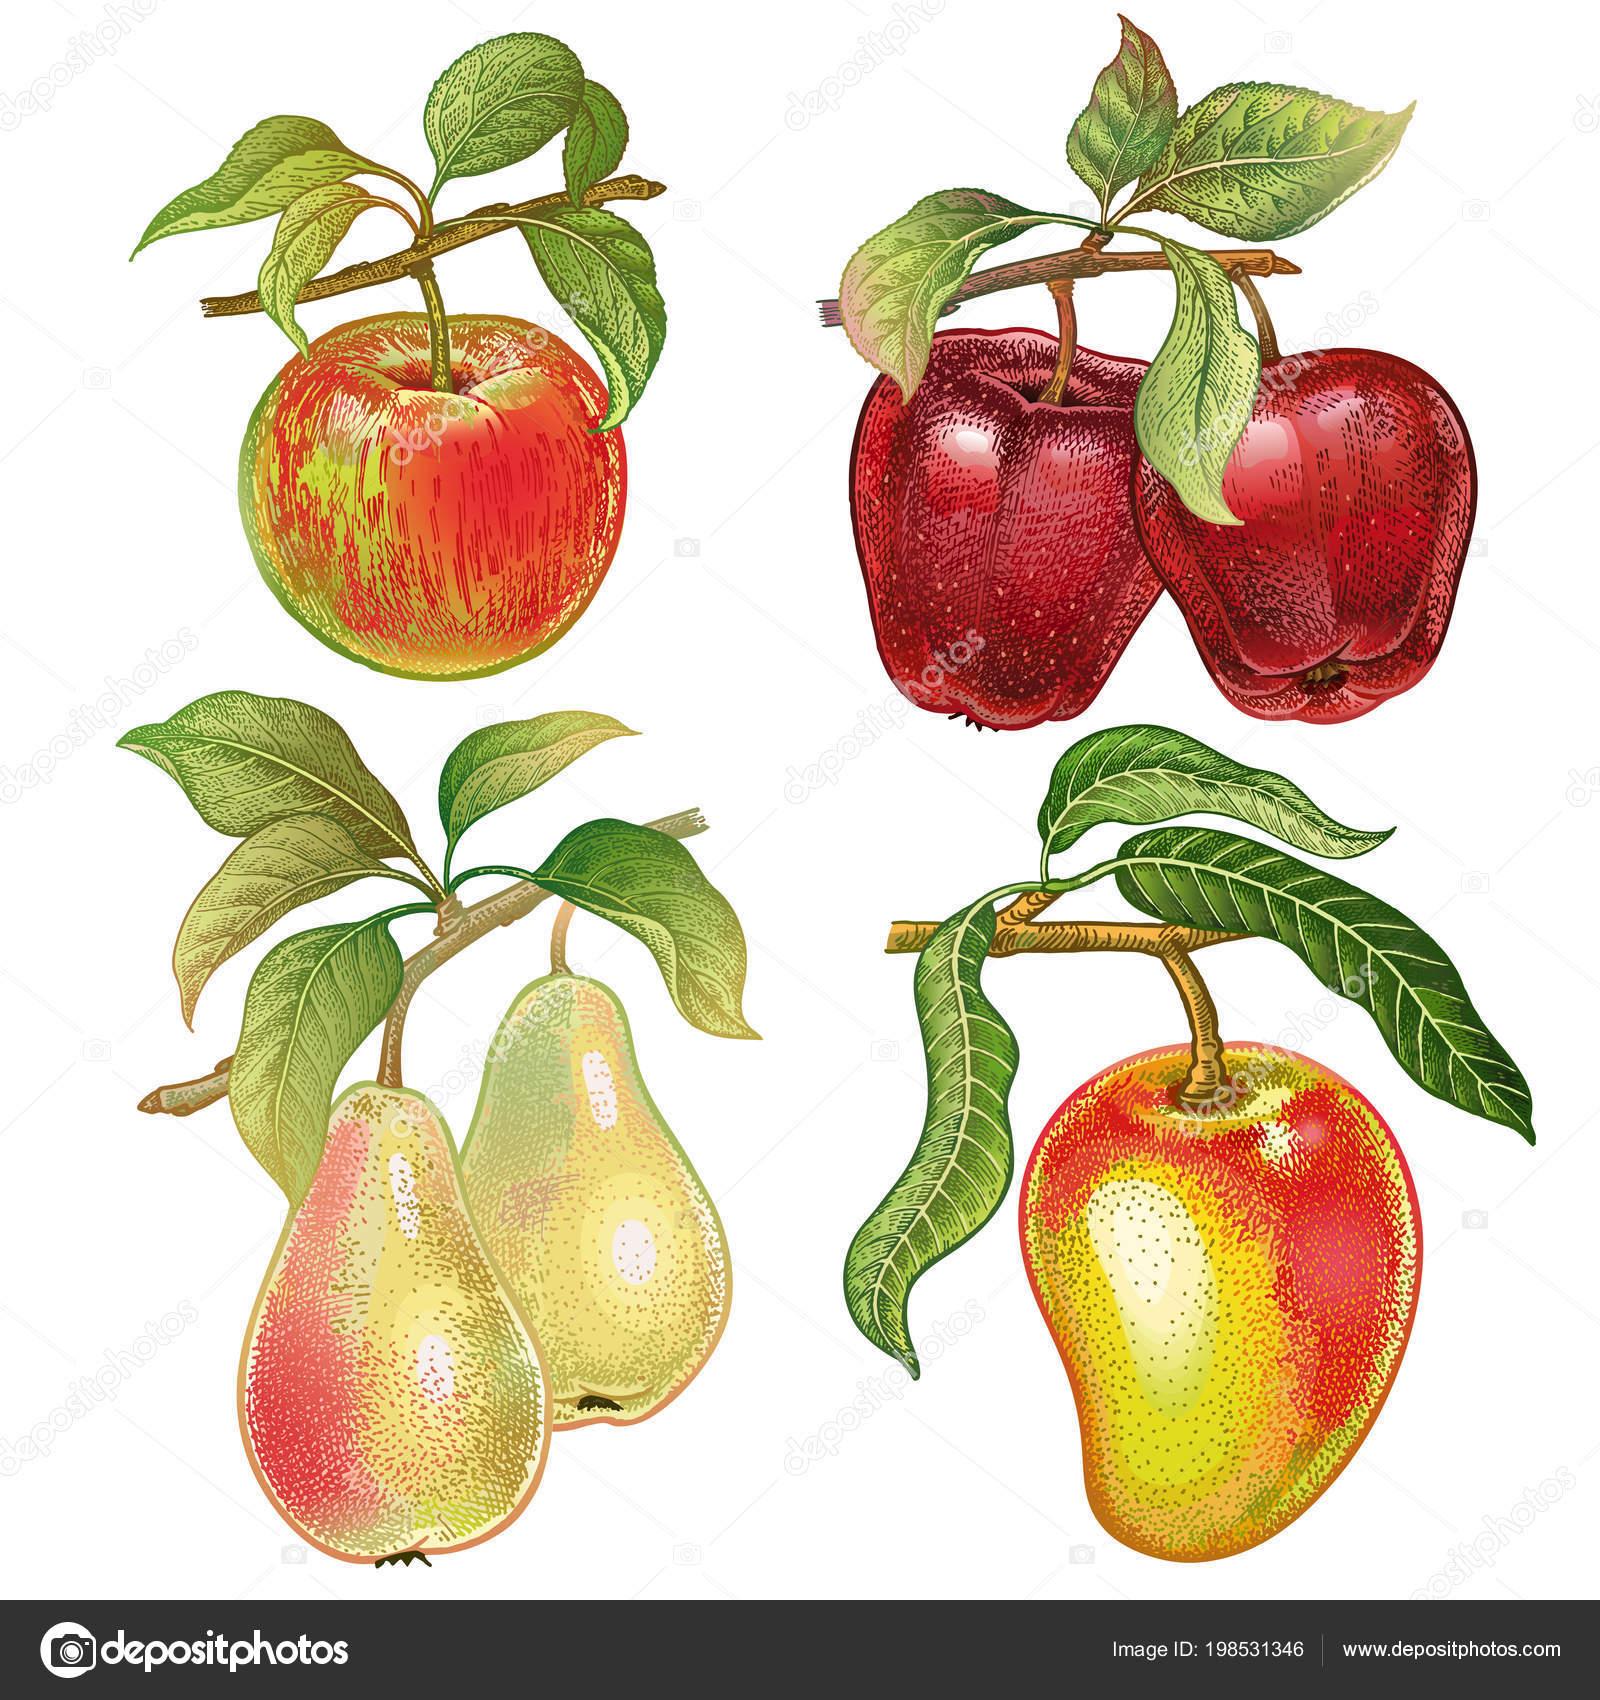 Sada Bobule Ovoce Realisticke Rucni Kresba Pastelkami Cervena Jablka